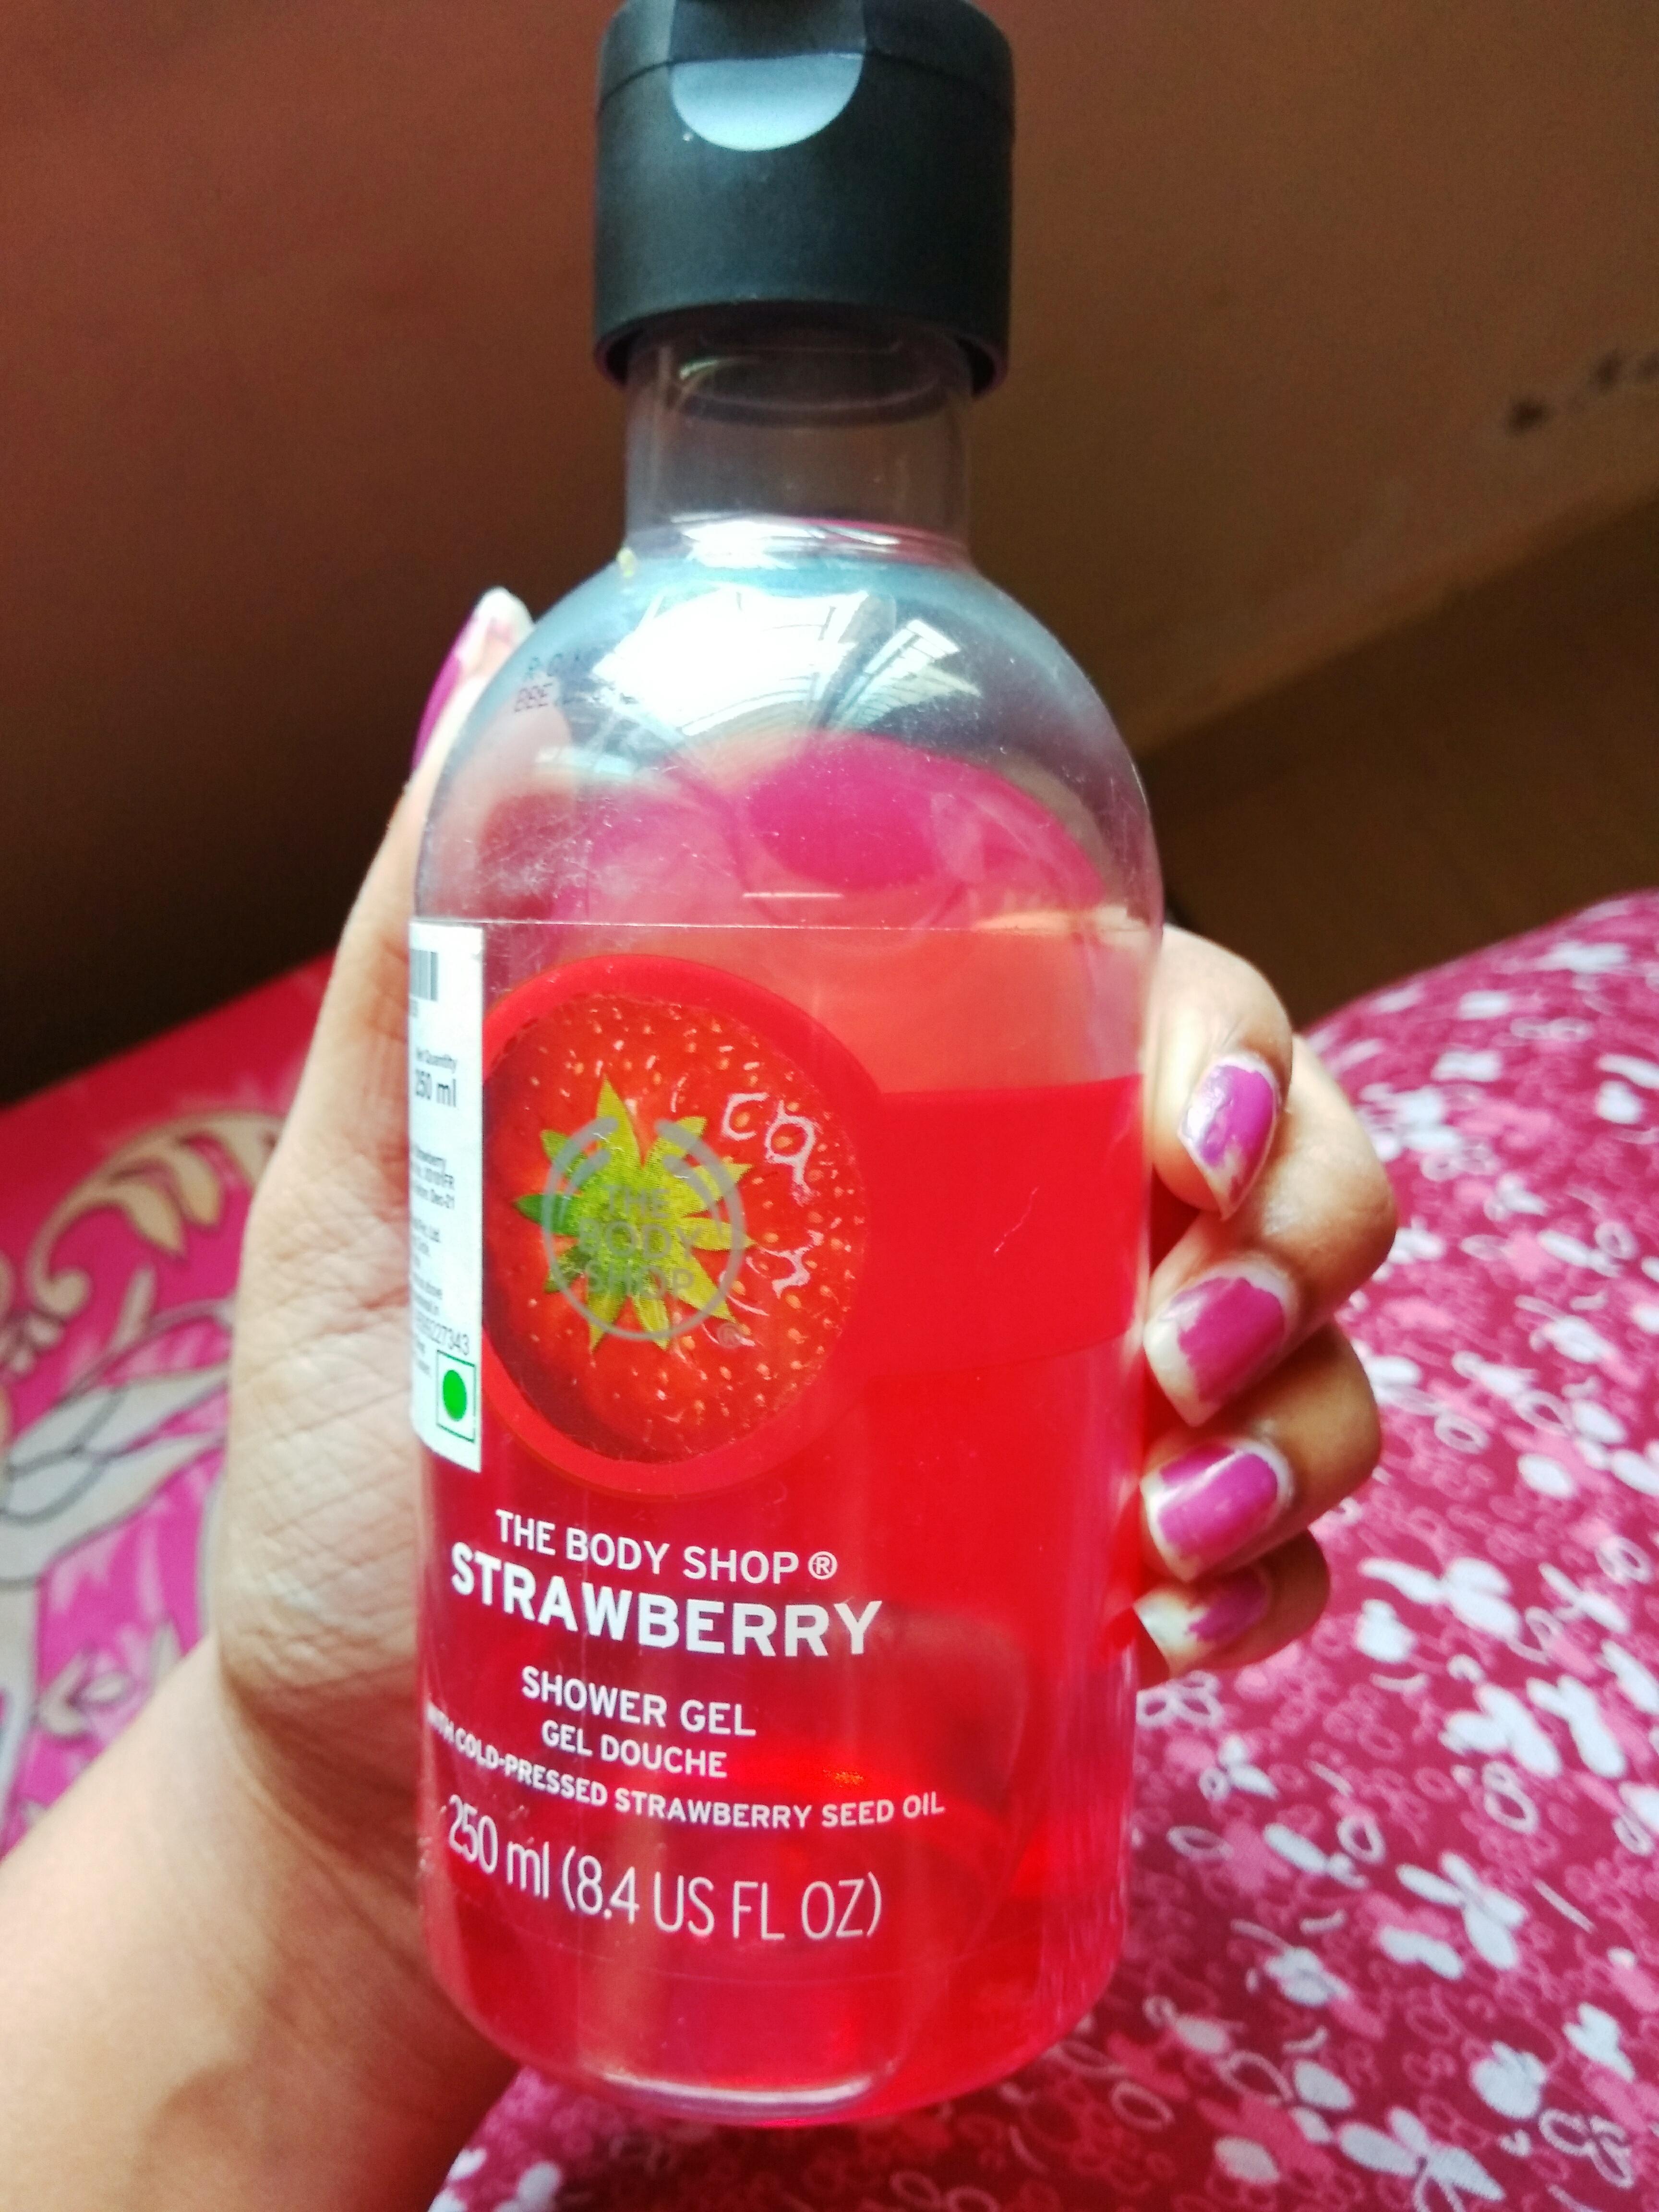 The Body Shop Strawberry Shower Gel -Amazing product-By karishma